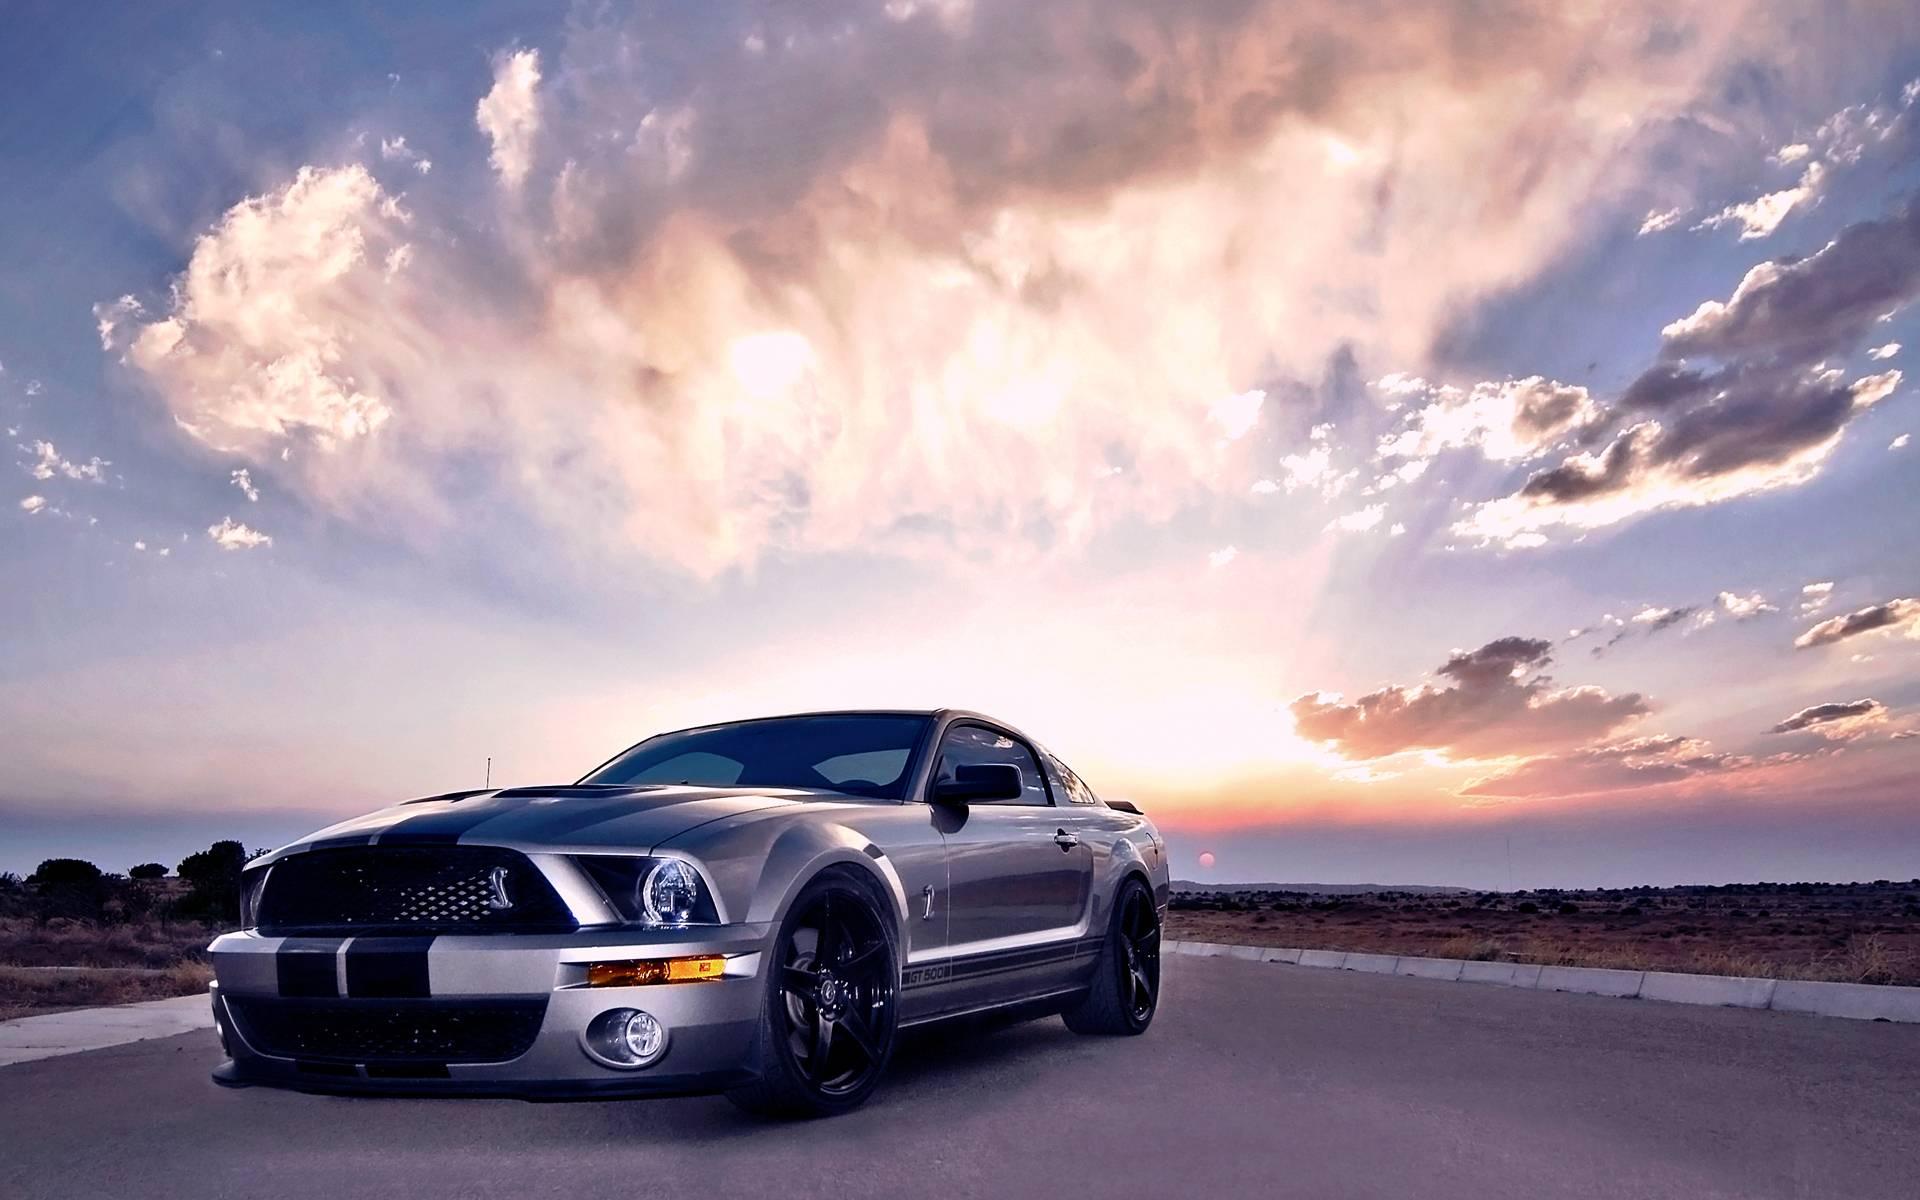 Mustang gt500 wallpapers wallpaper cave - Wallpaper mustang shelby gt500 ...